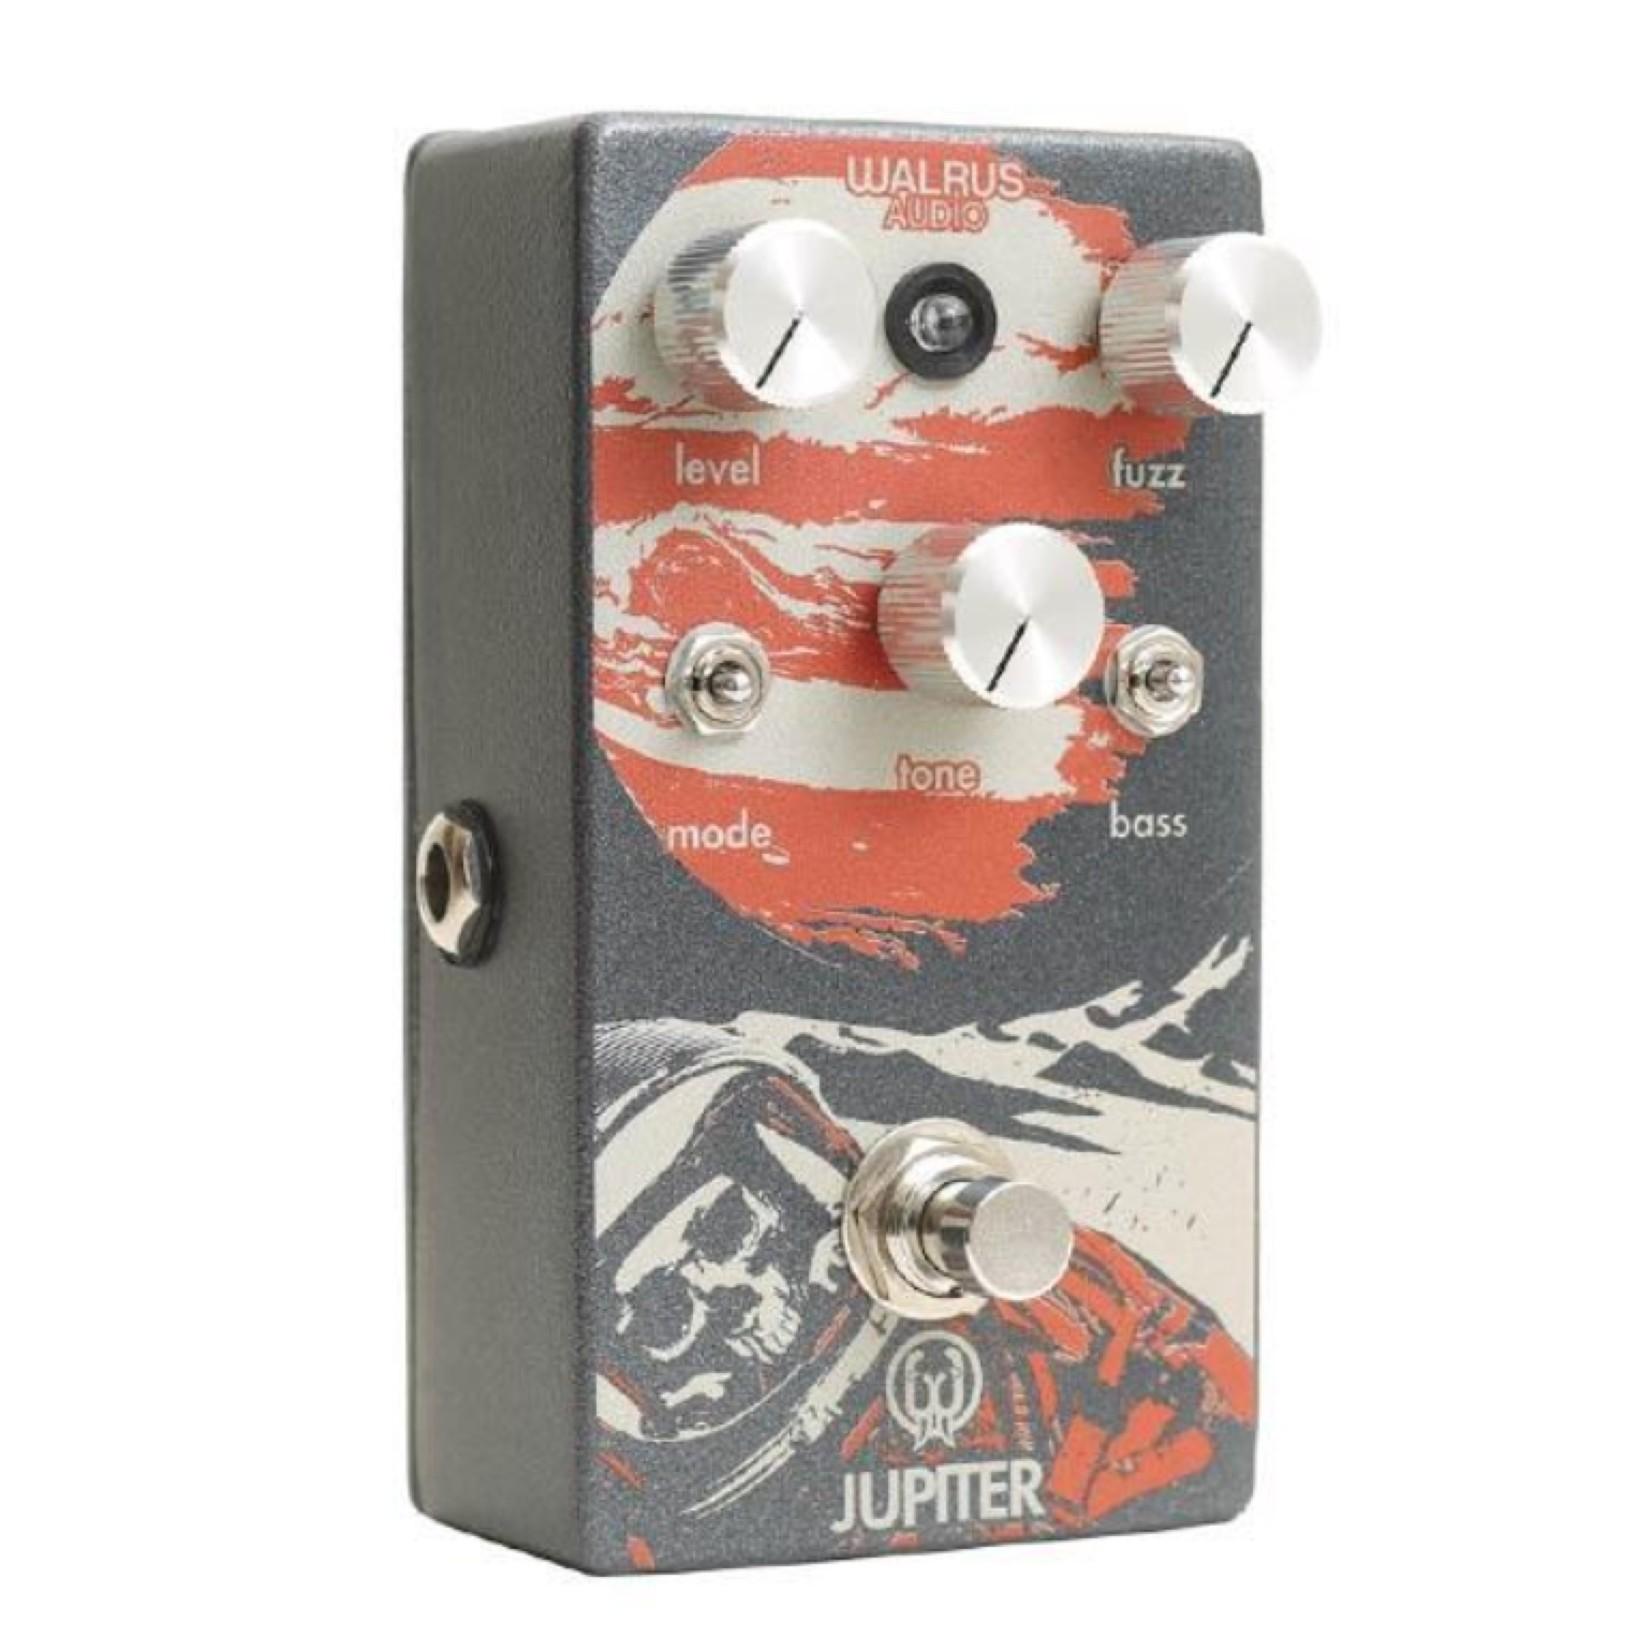 Walrus Audio Walrus Audio Jupiter Multi-Clip Fuzz V2